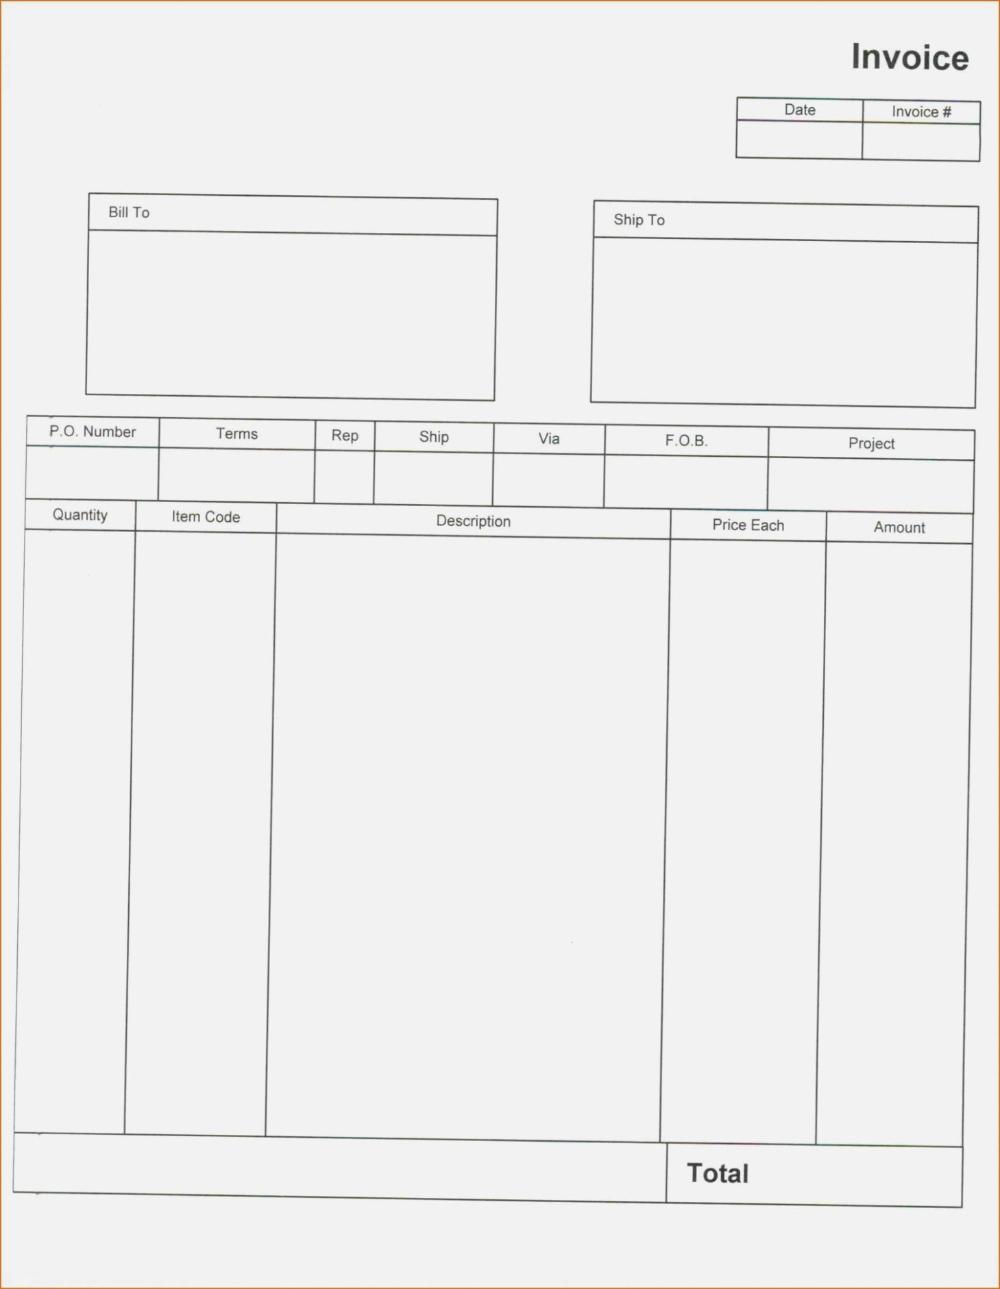 Quickbooks Invoice Templates Download Desktop Template Excel With Regard To Quickbooks Invoice Templa Blank Invoice Template Invoice Template Printable Invoice